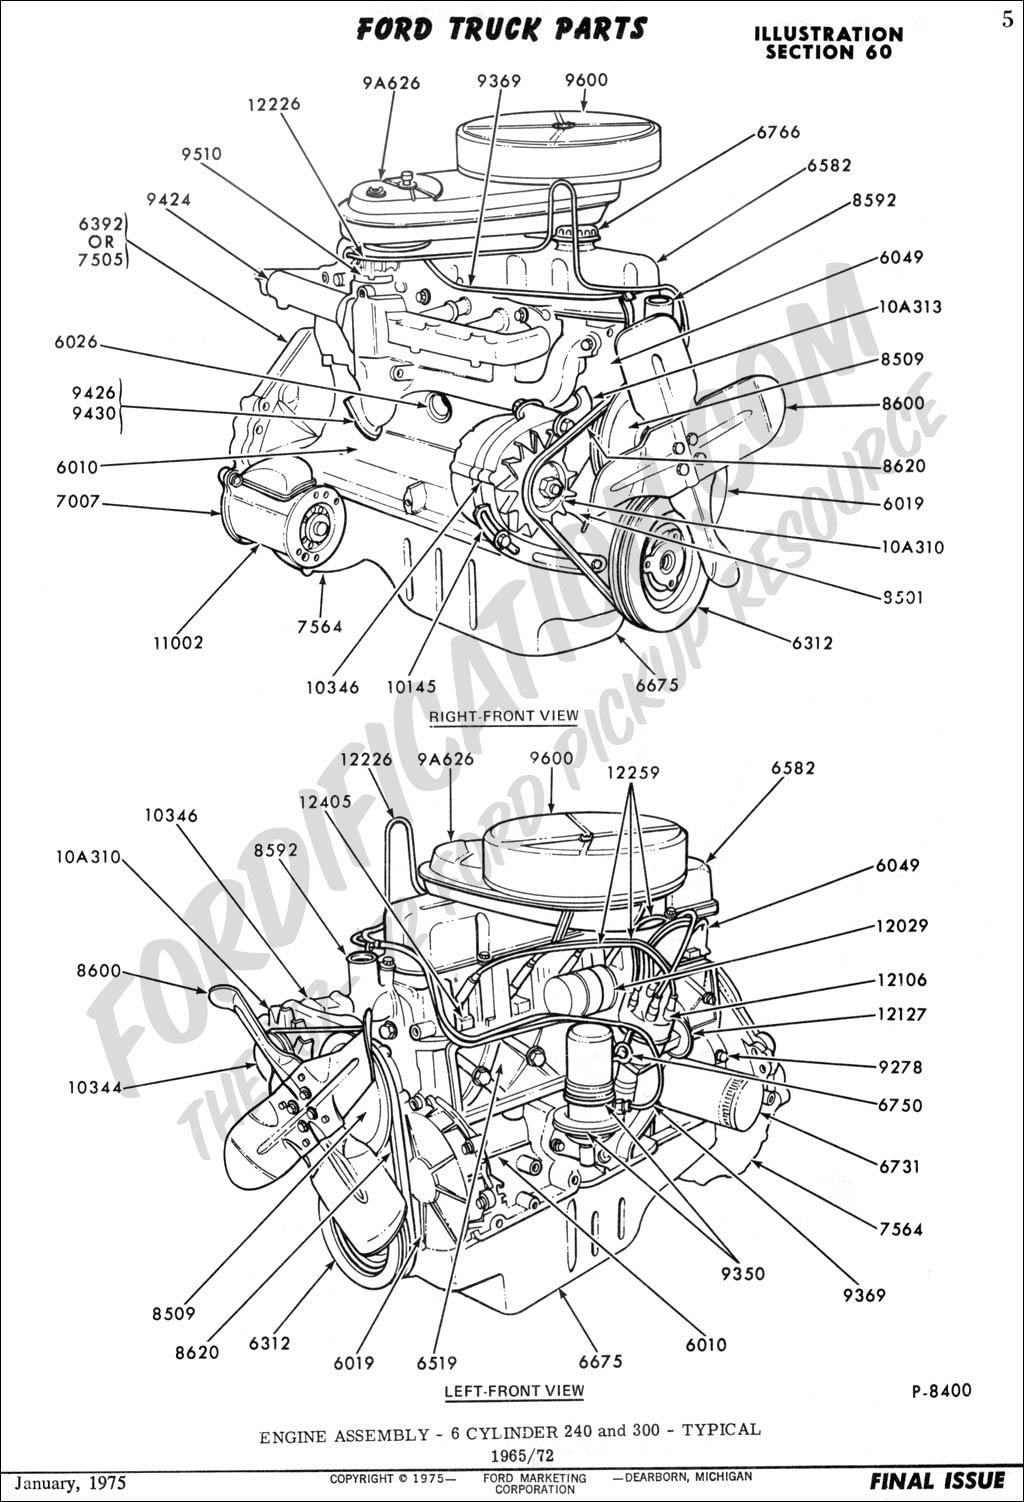 1990 ford f700 truck wiring diagram